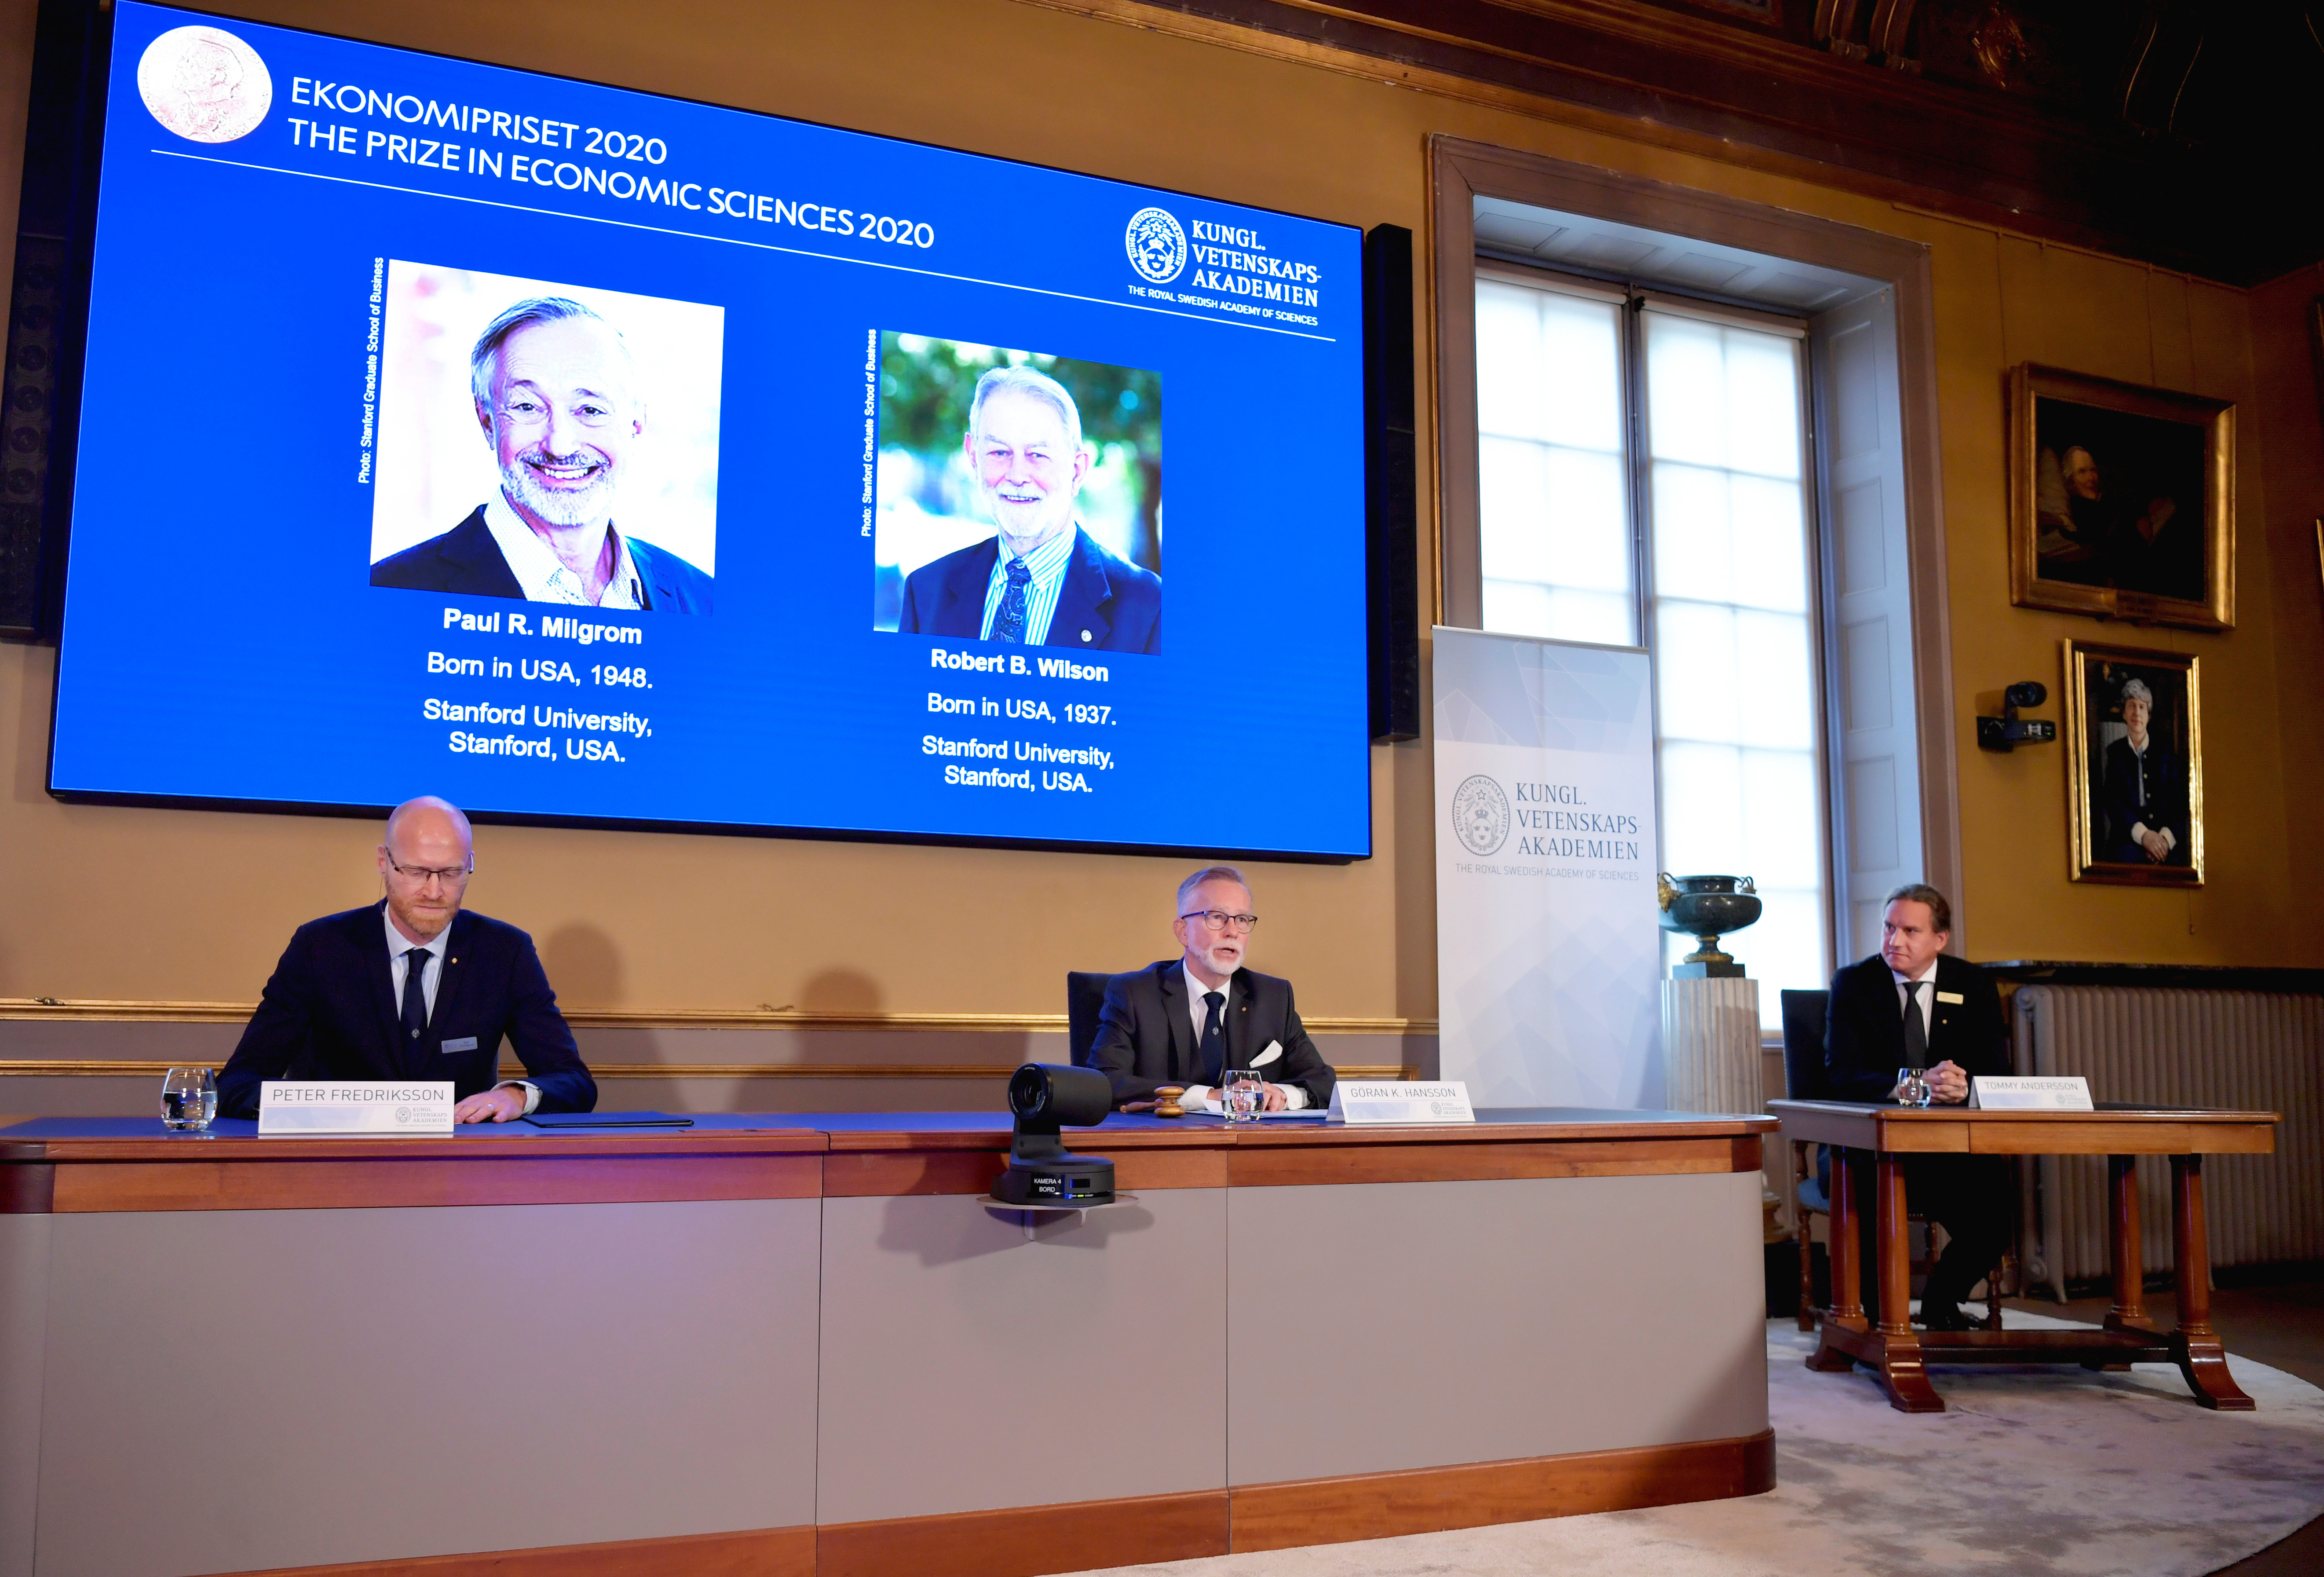 nobel prize economics 2020 award auction theory science economies policies money fund Sweden Paul Milgrom and Robert Wilson  academy